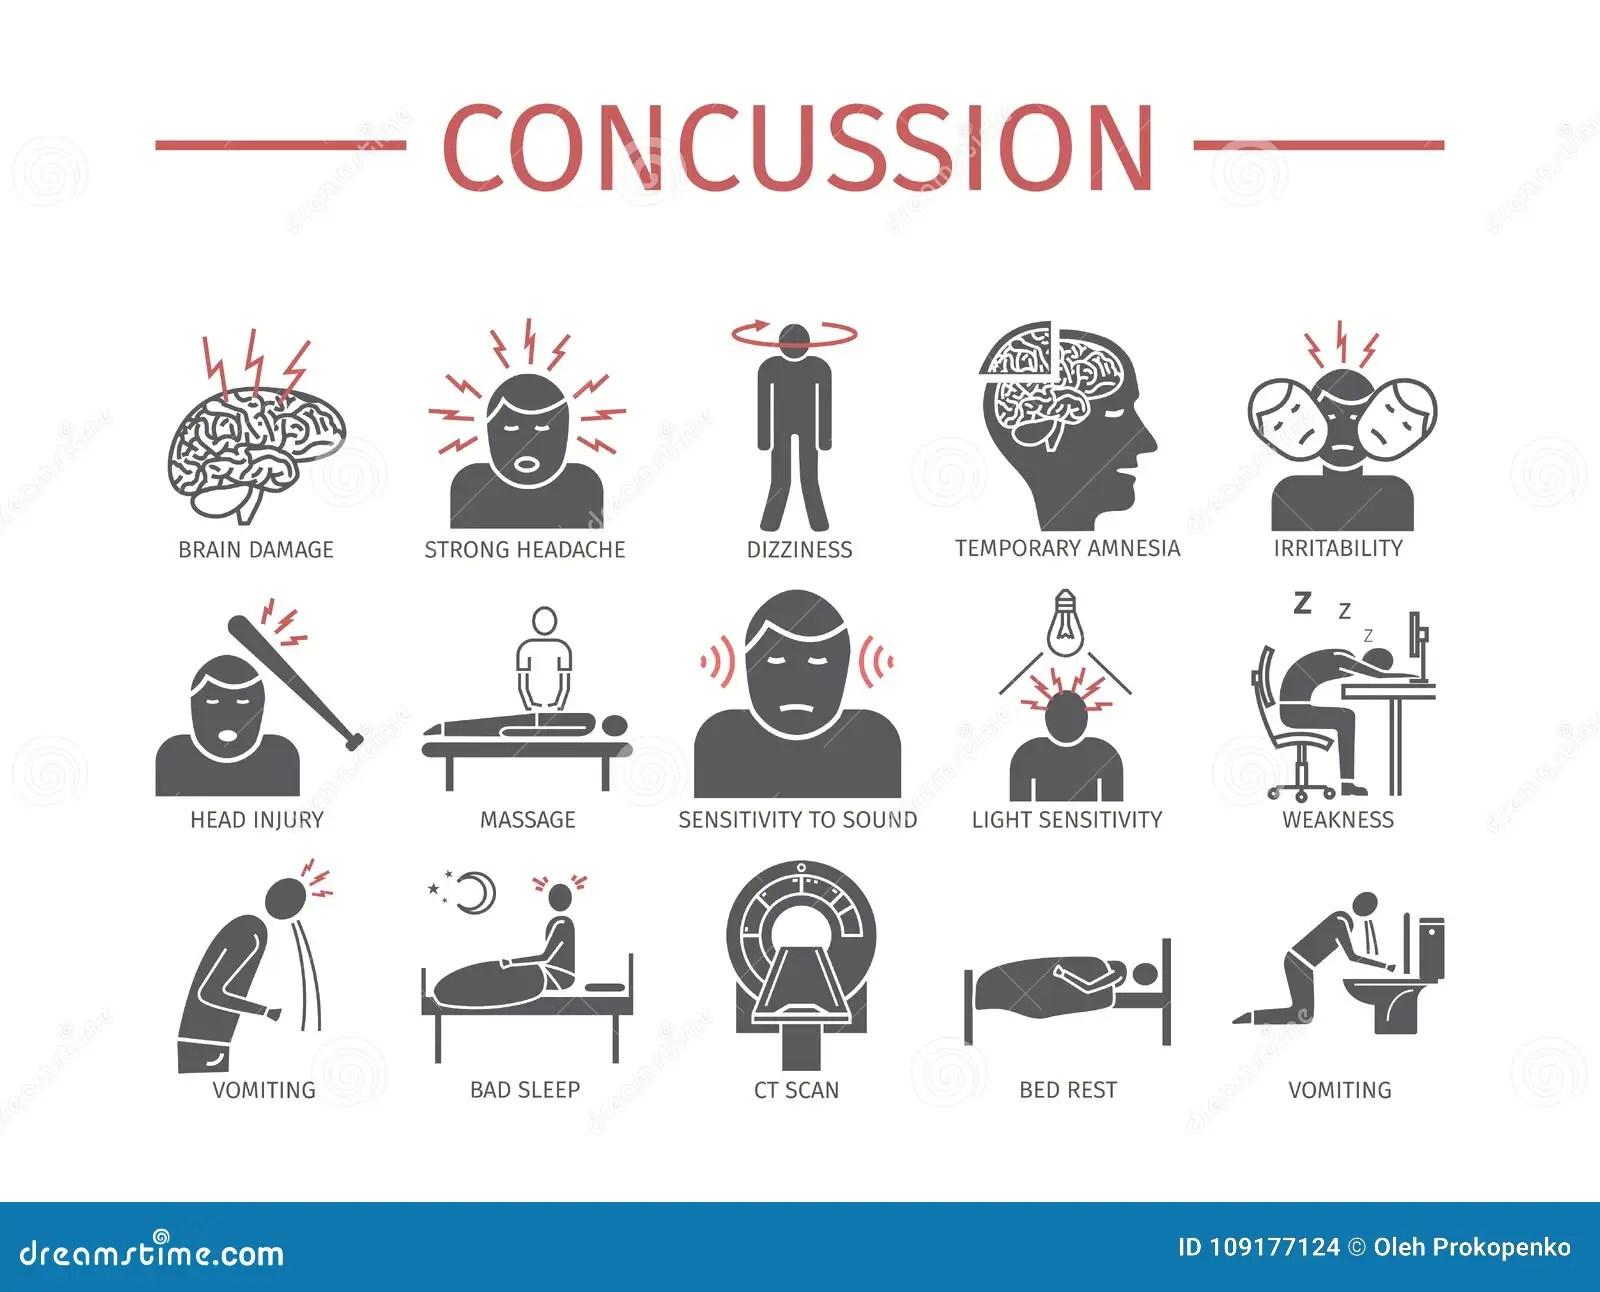 Concussion Symptoms Treatment Flat Icons Set Vector